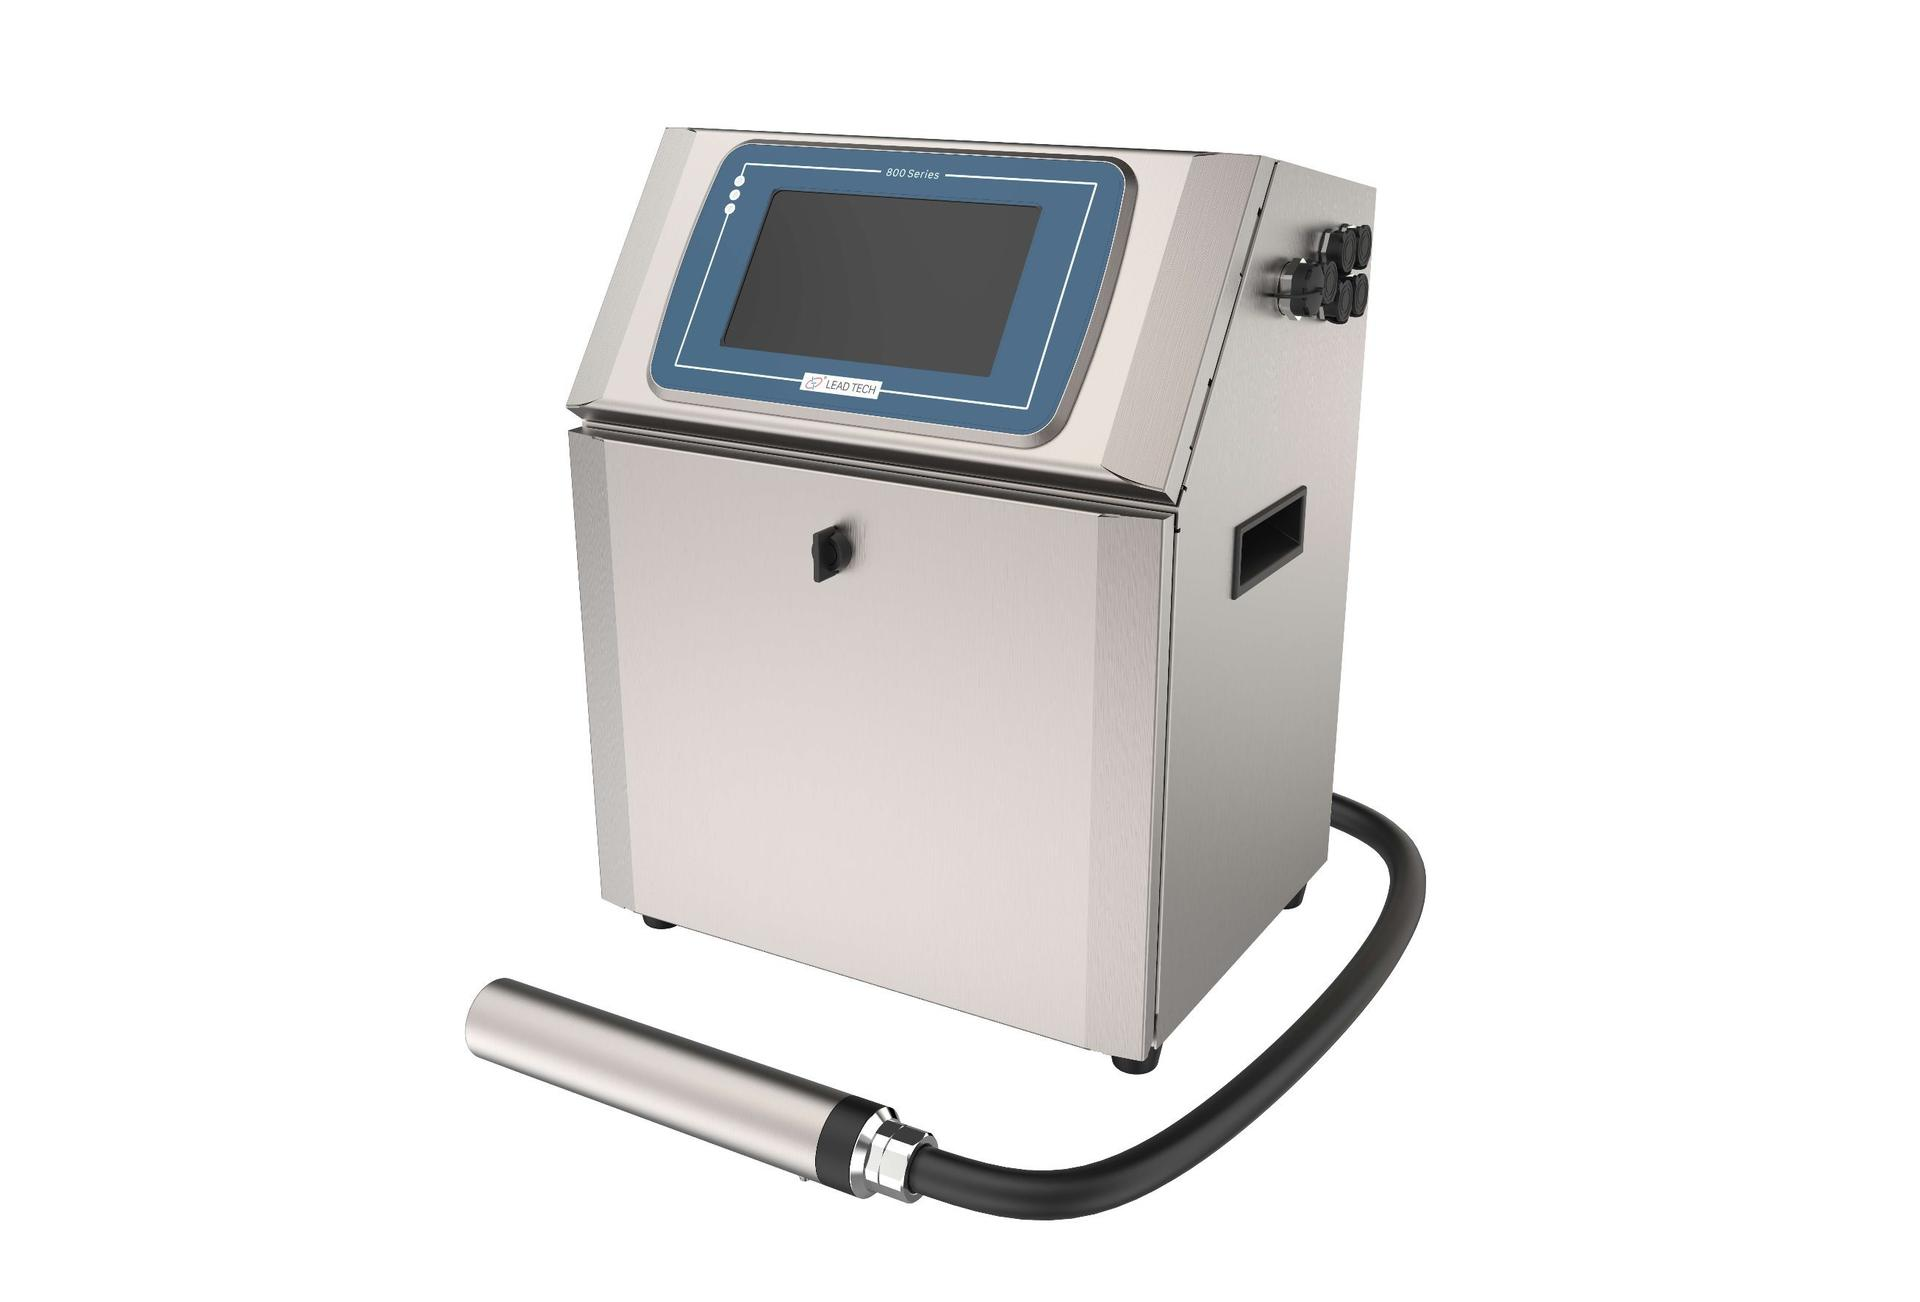 Lt800 Moving Head Printing Cij Inkjet Printer